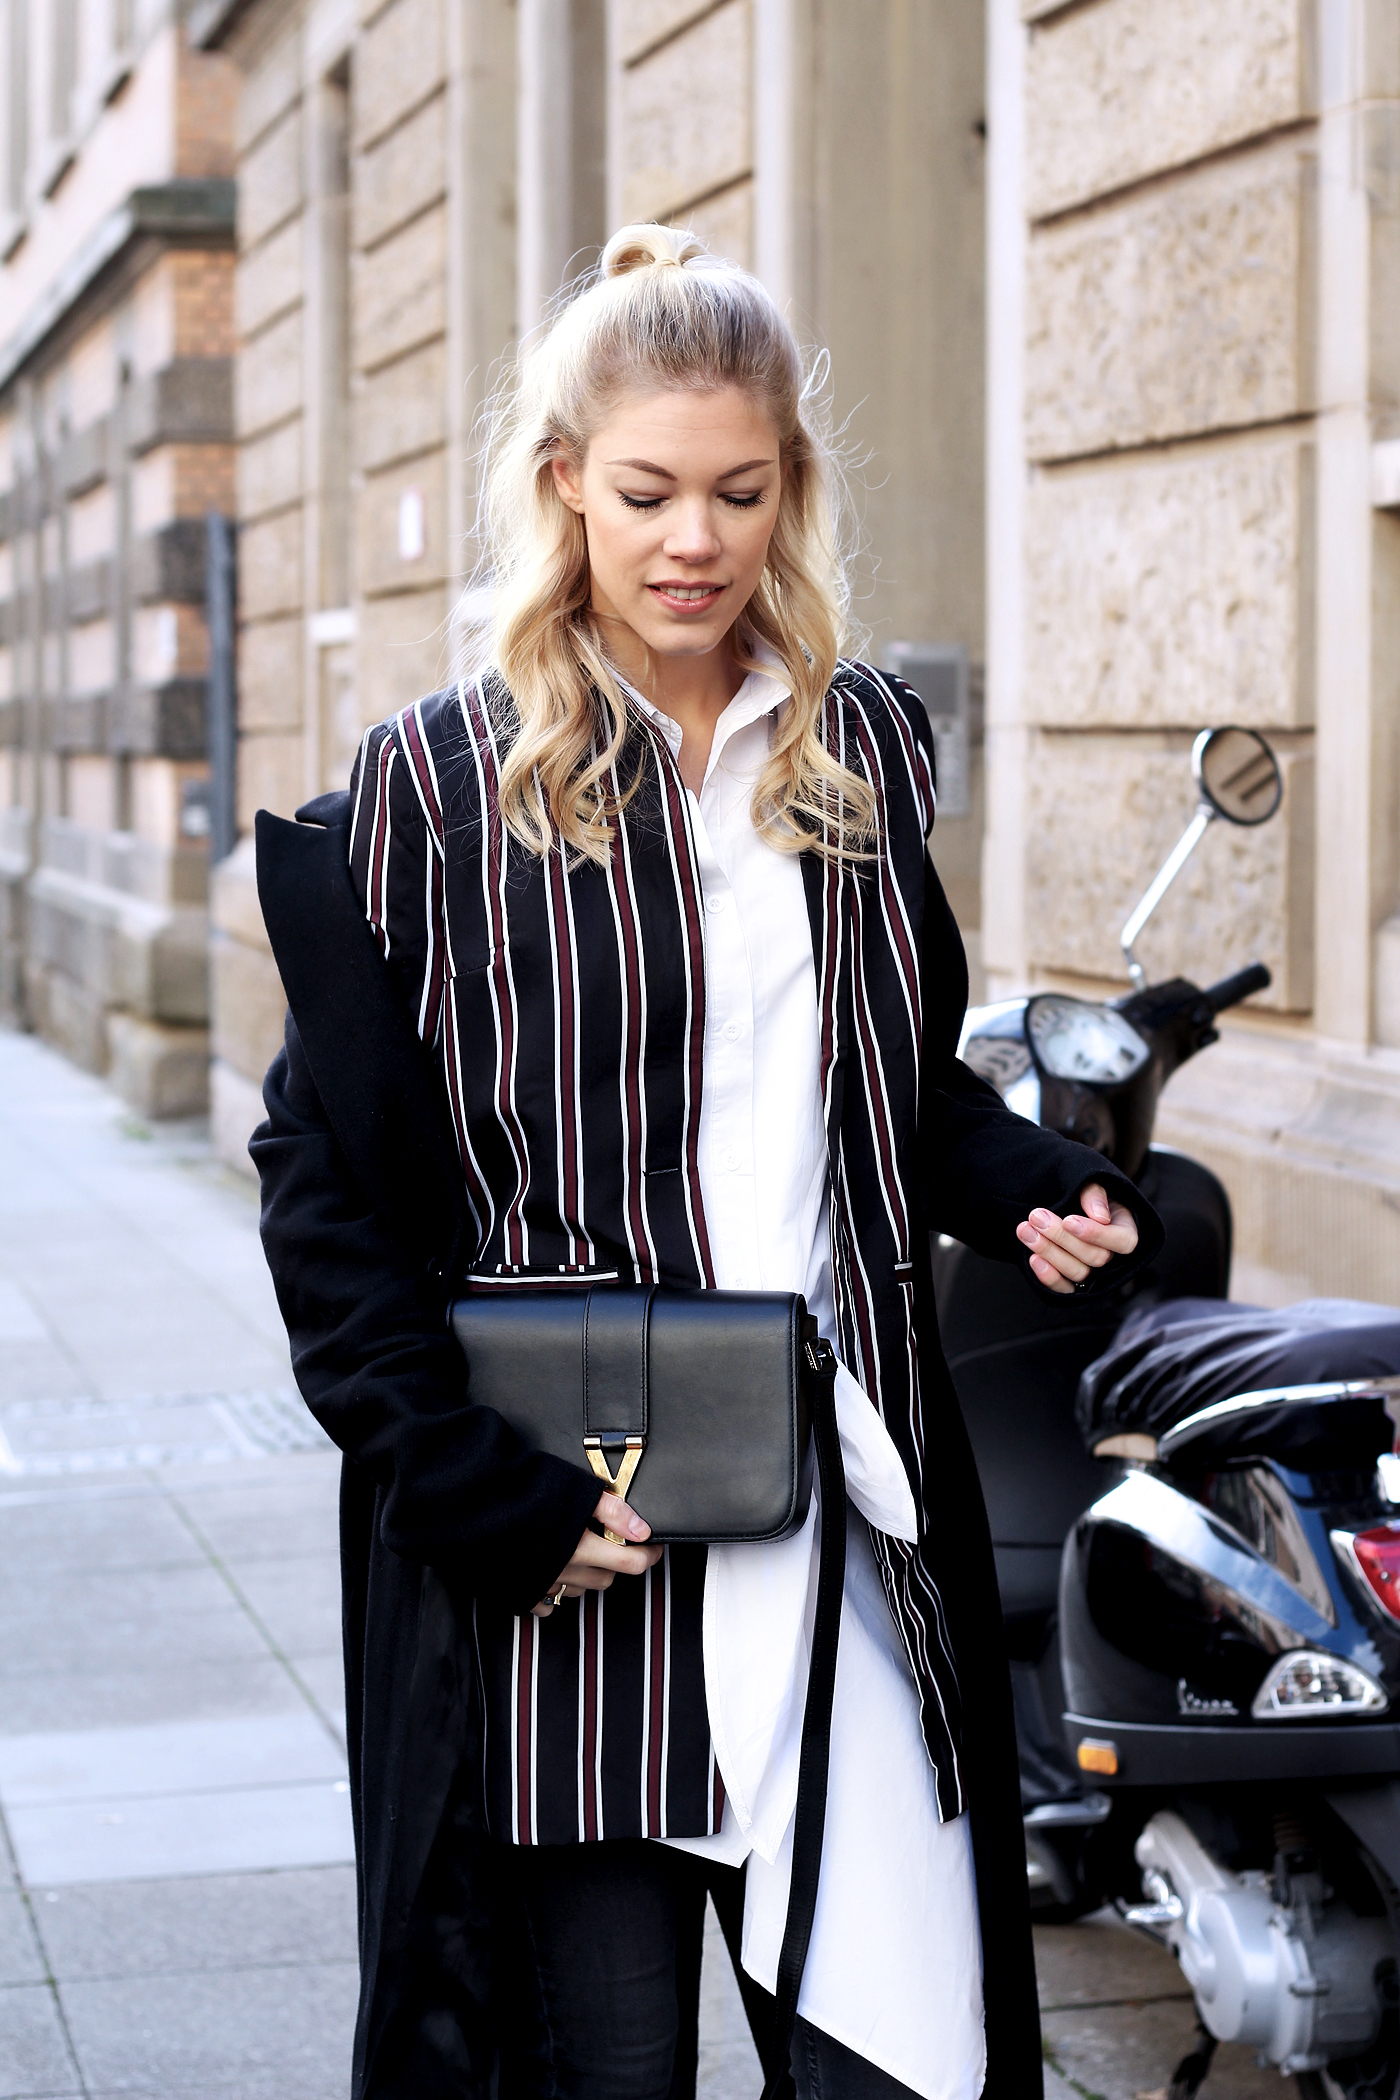 somehappyshoes_fashionblog_blazer_saintlaurent_blouse4